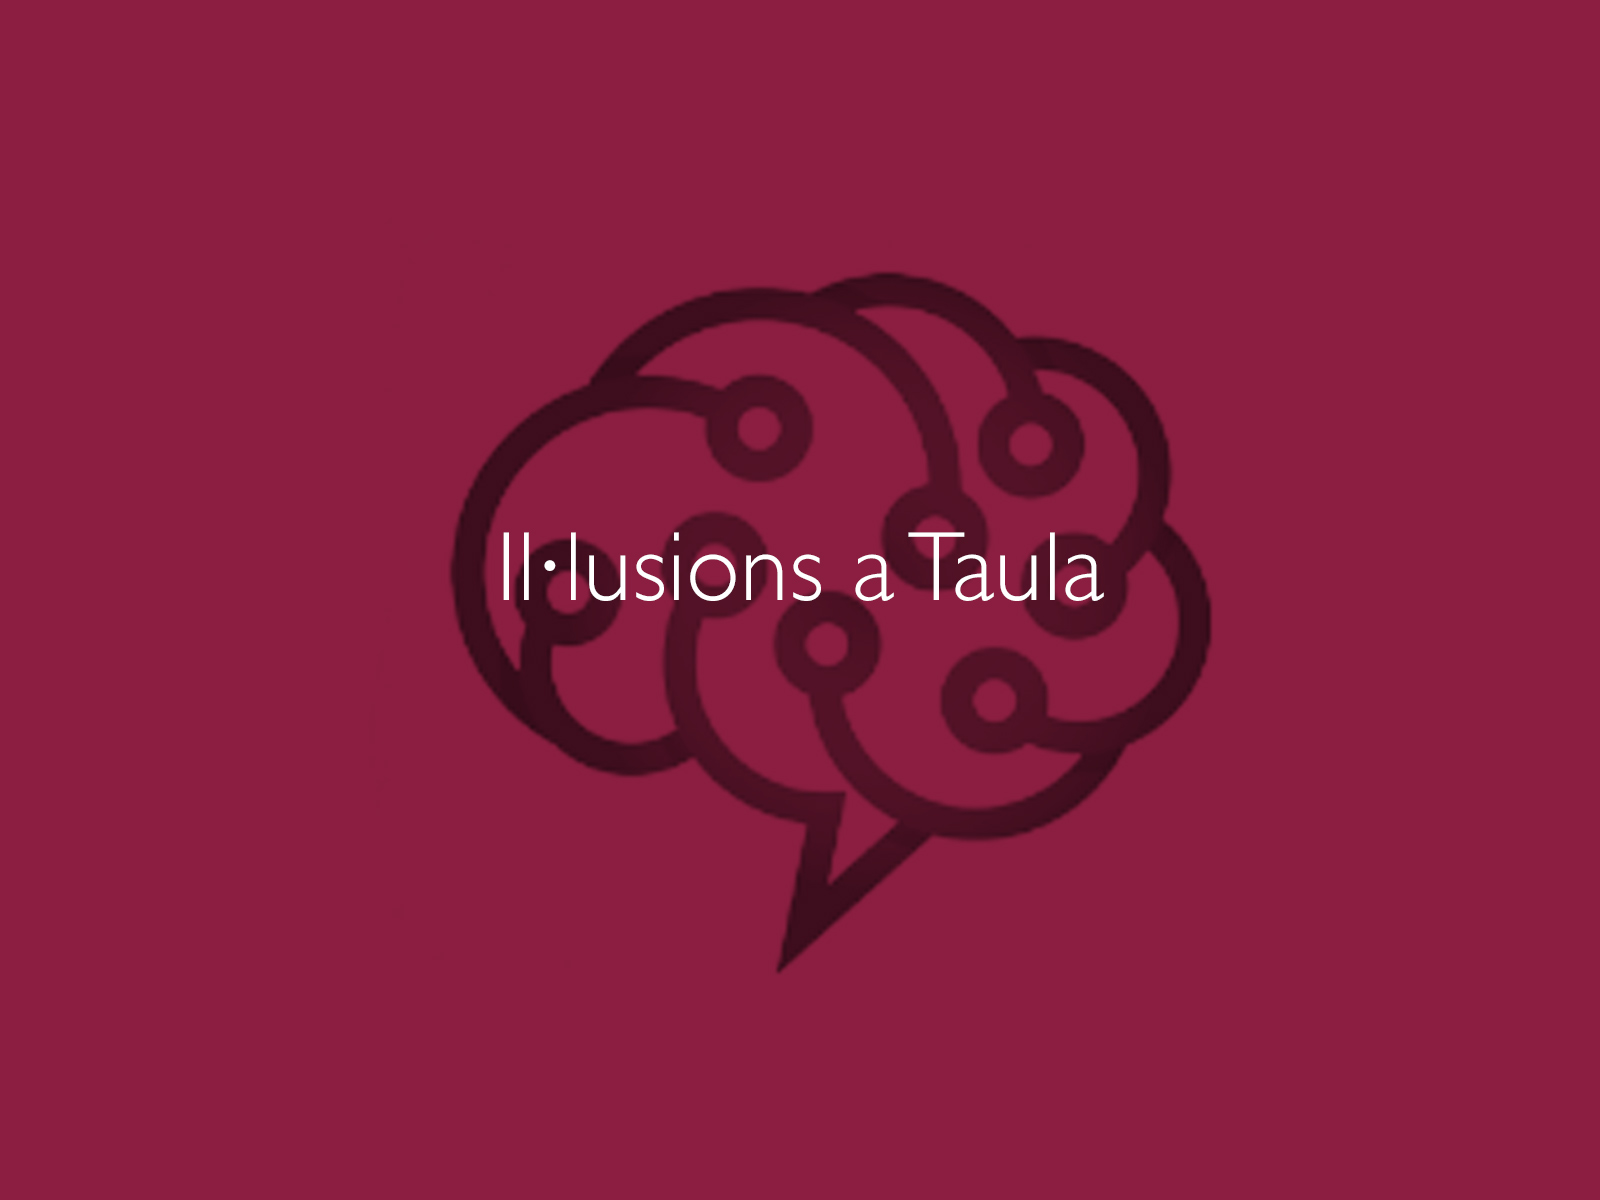 Sergal - Il·lusions a Taula - Rotary Club Vic-Osona